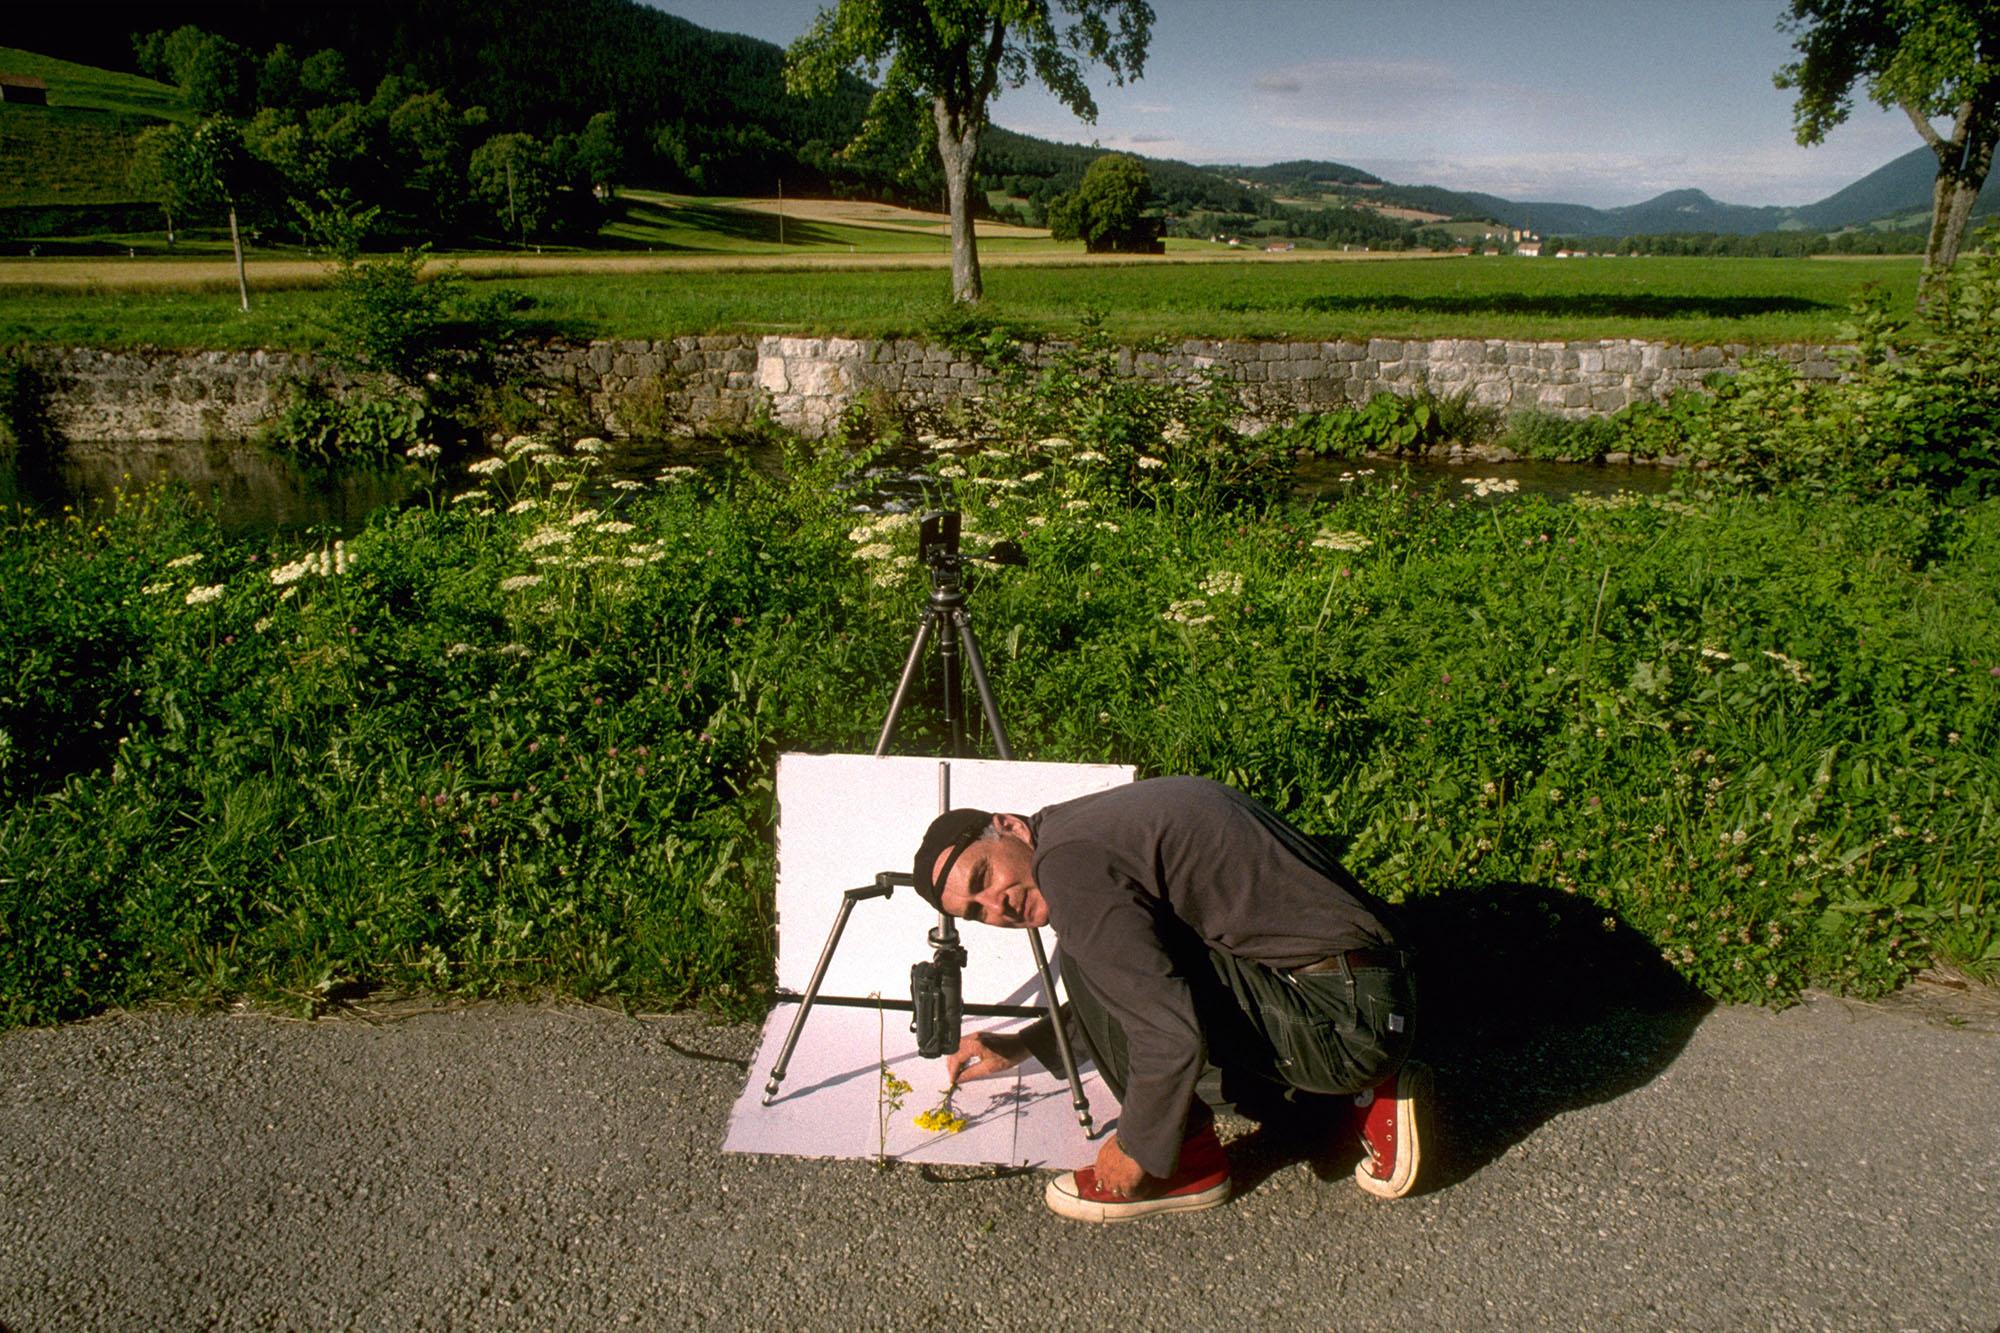 1993-tournage-flora-travers-2000